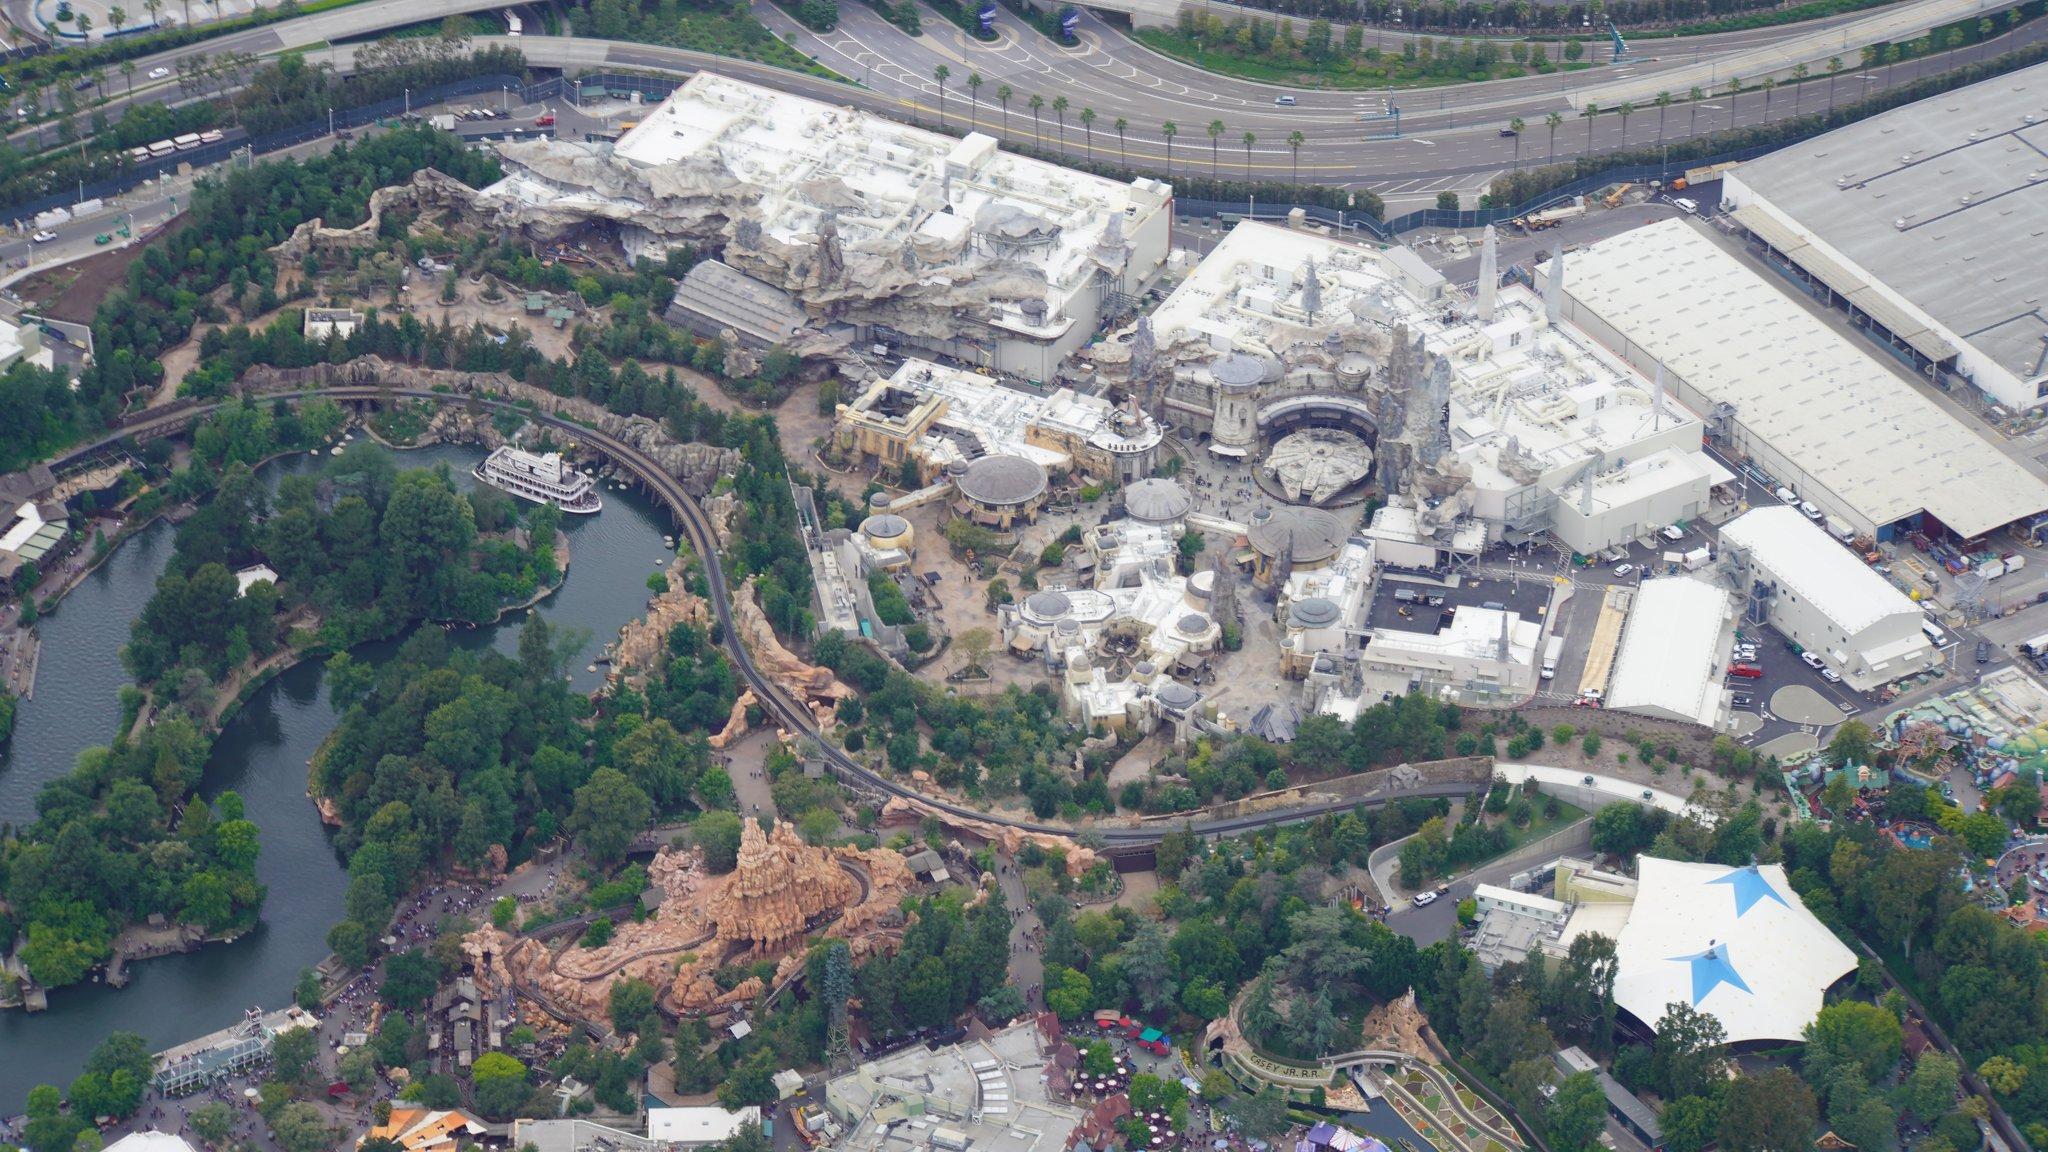 Disneyland Resort vu du ciel, des images sublimes! D6DVvyQUEAAh80M